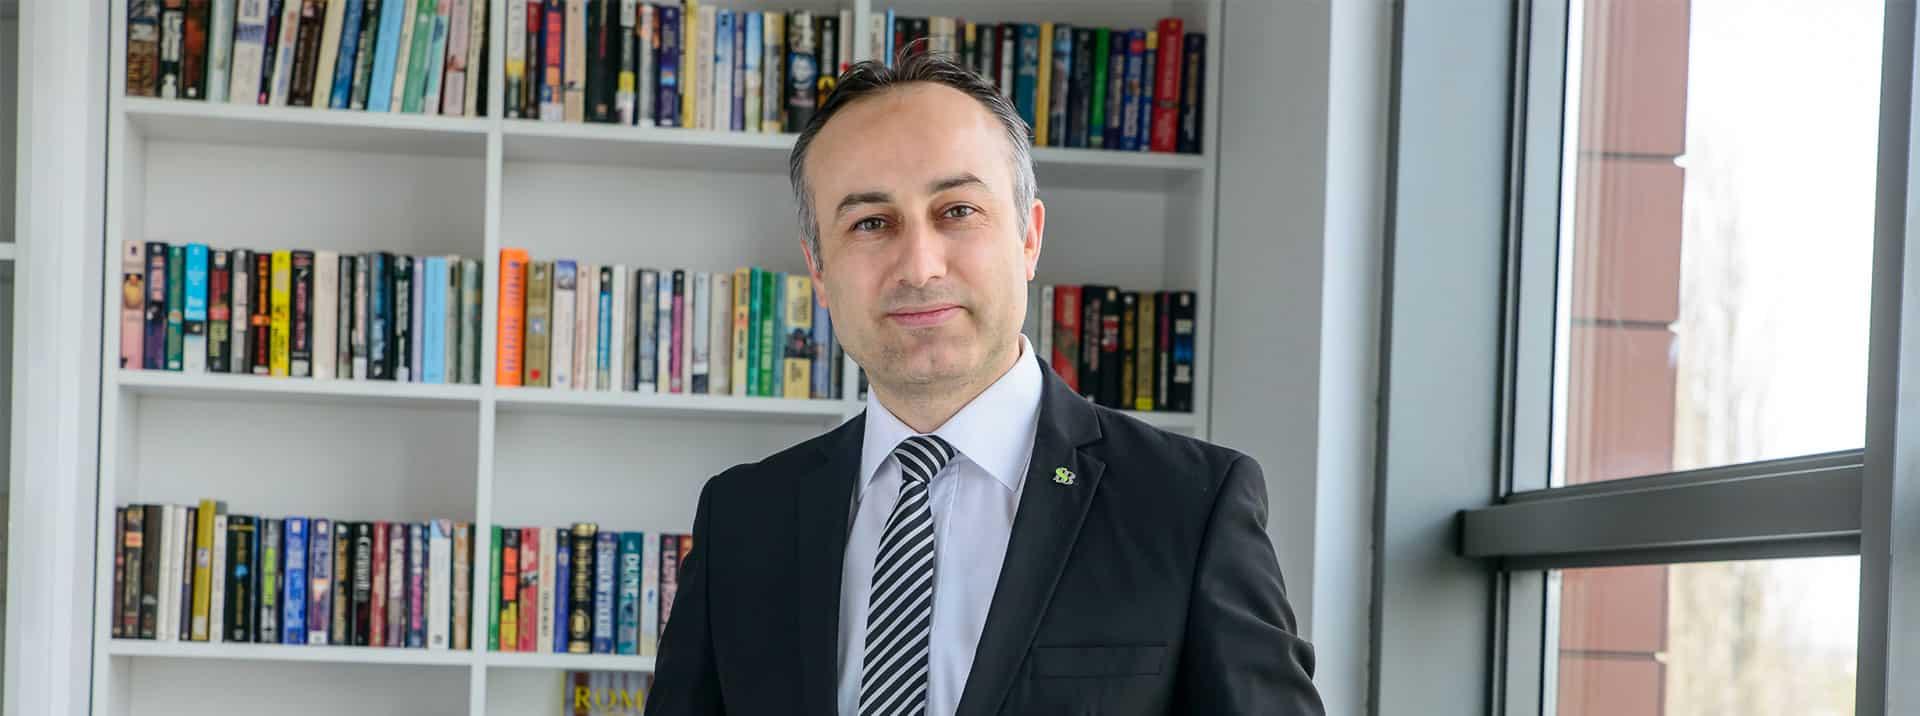 Interview with the Director of International School of Bucharest, Mr. Sinan Kosak